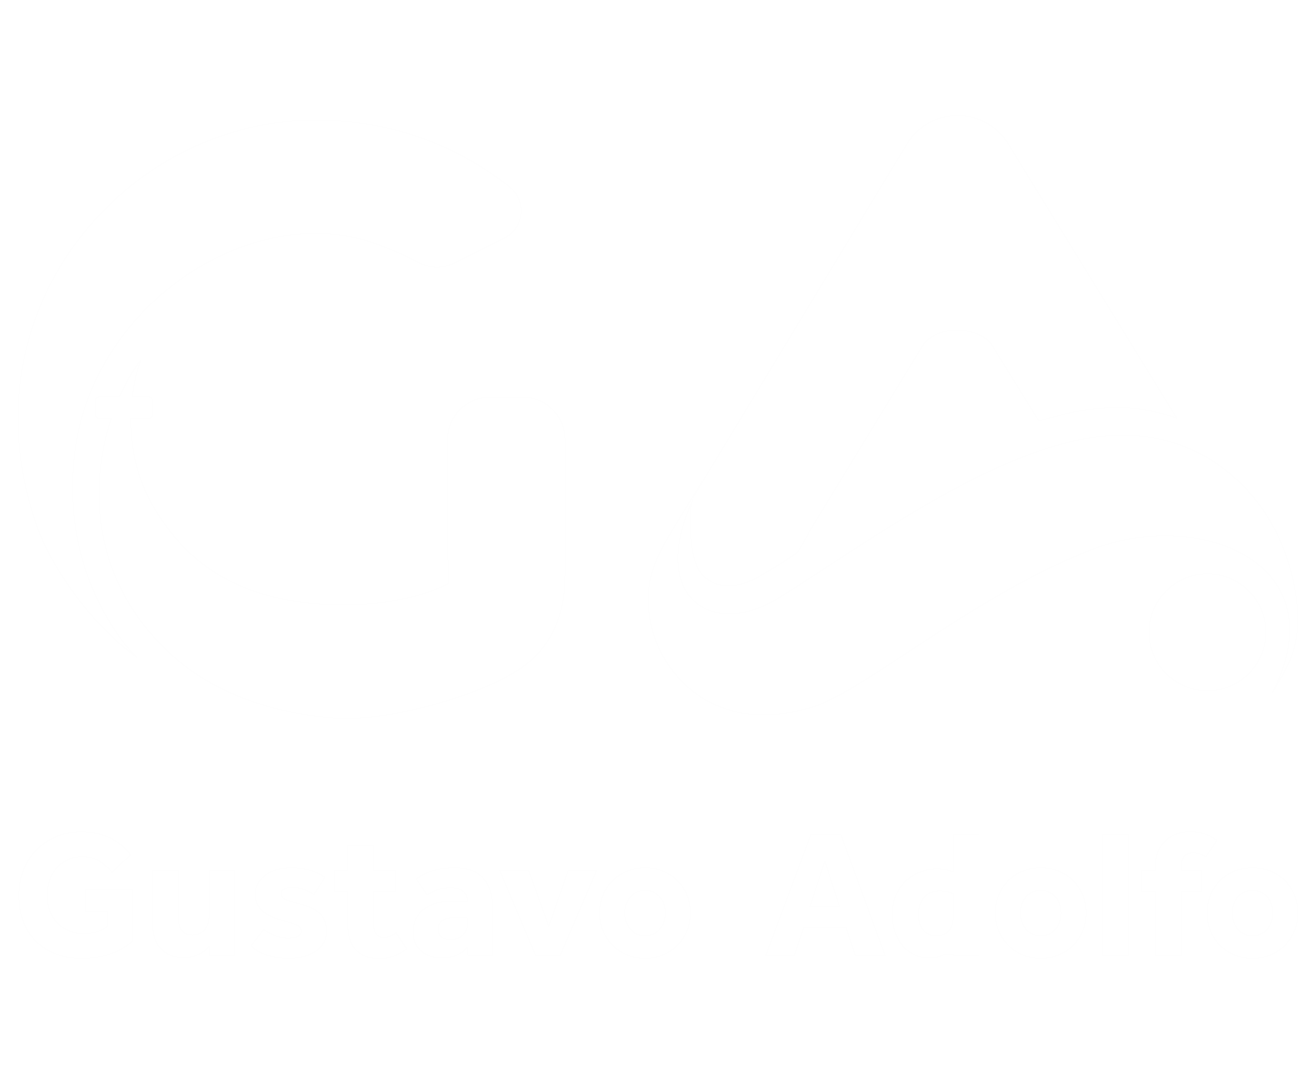 Lista de material escolar 2019 – Colégio Sinodal Gustavo Adolfo